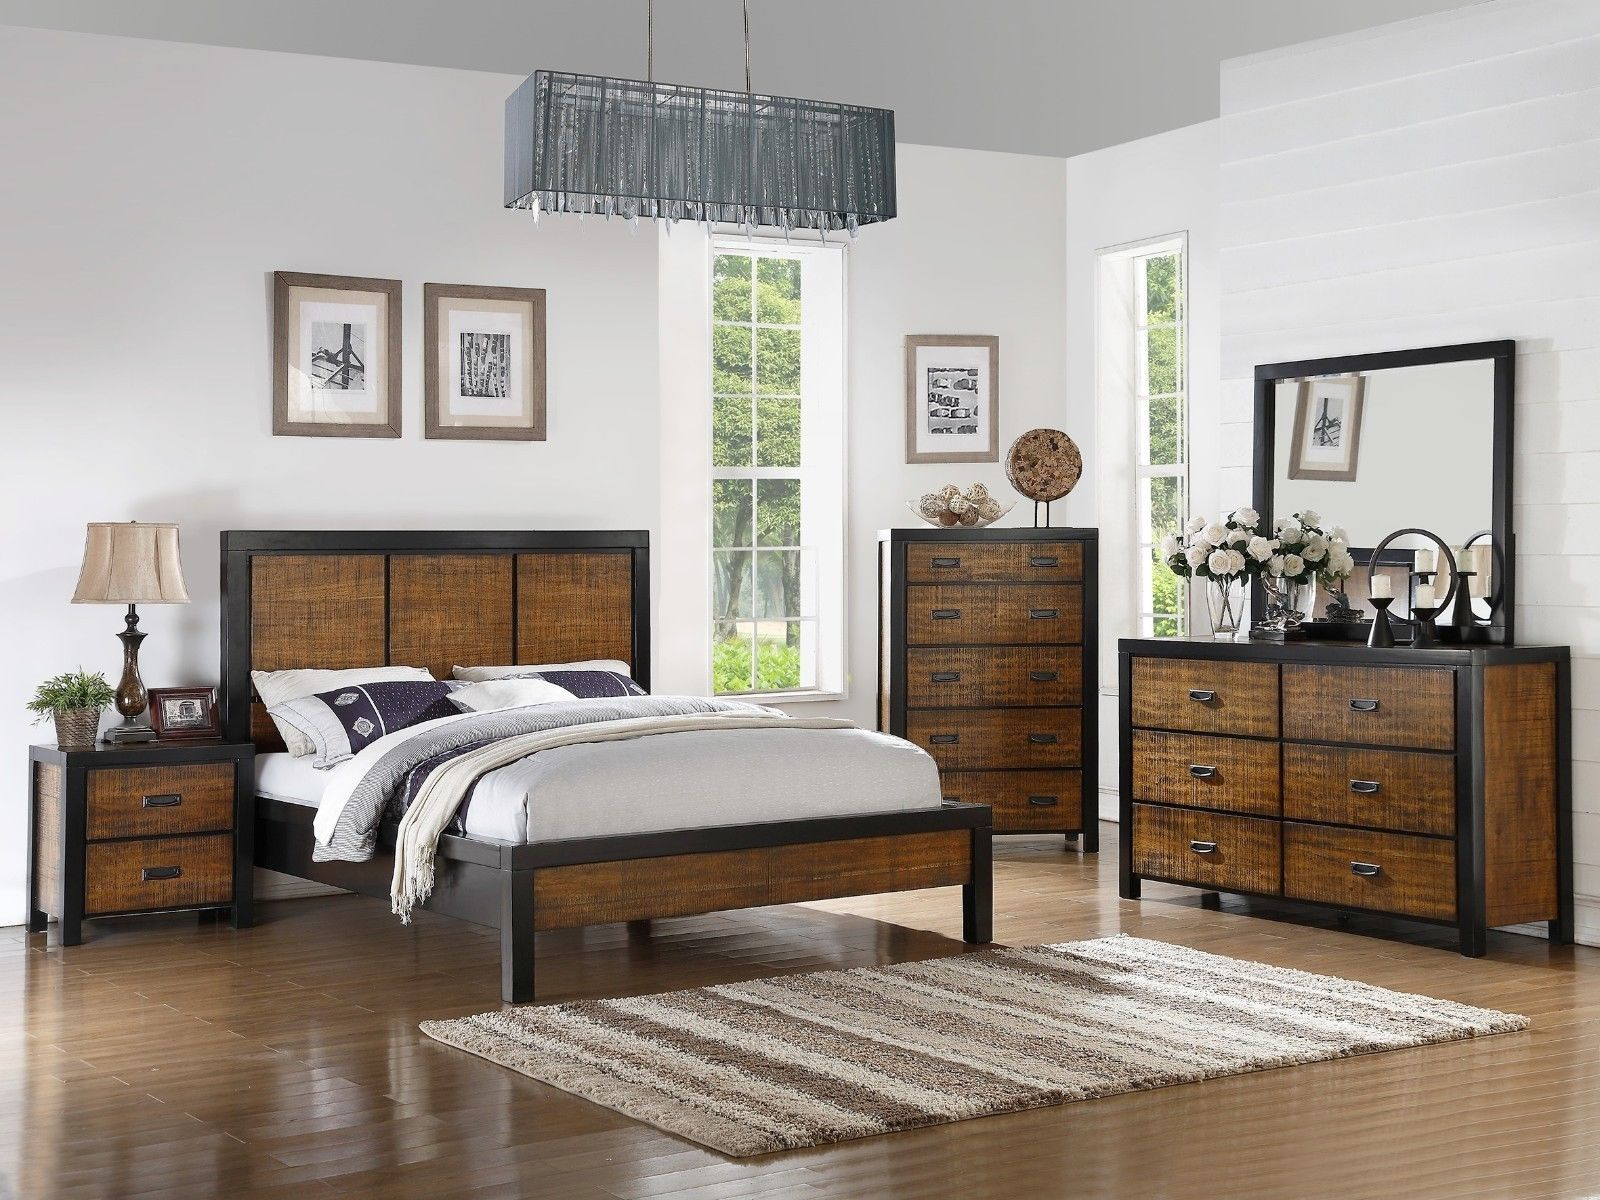 Master bedroom headboard  Master Bedroom Queen Cal King Est King Bed Casual Headboard